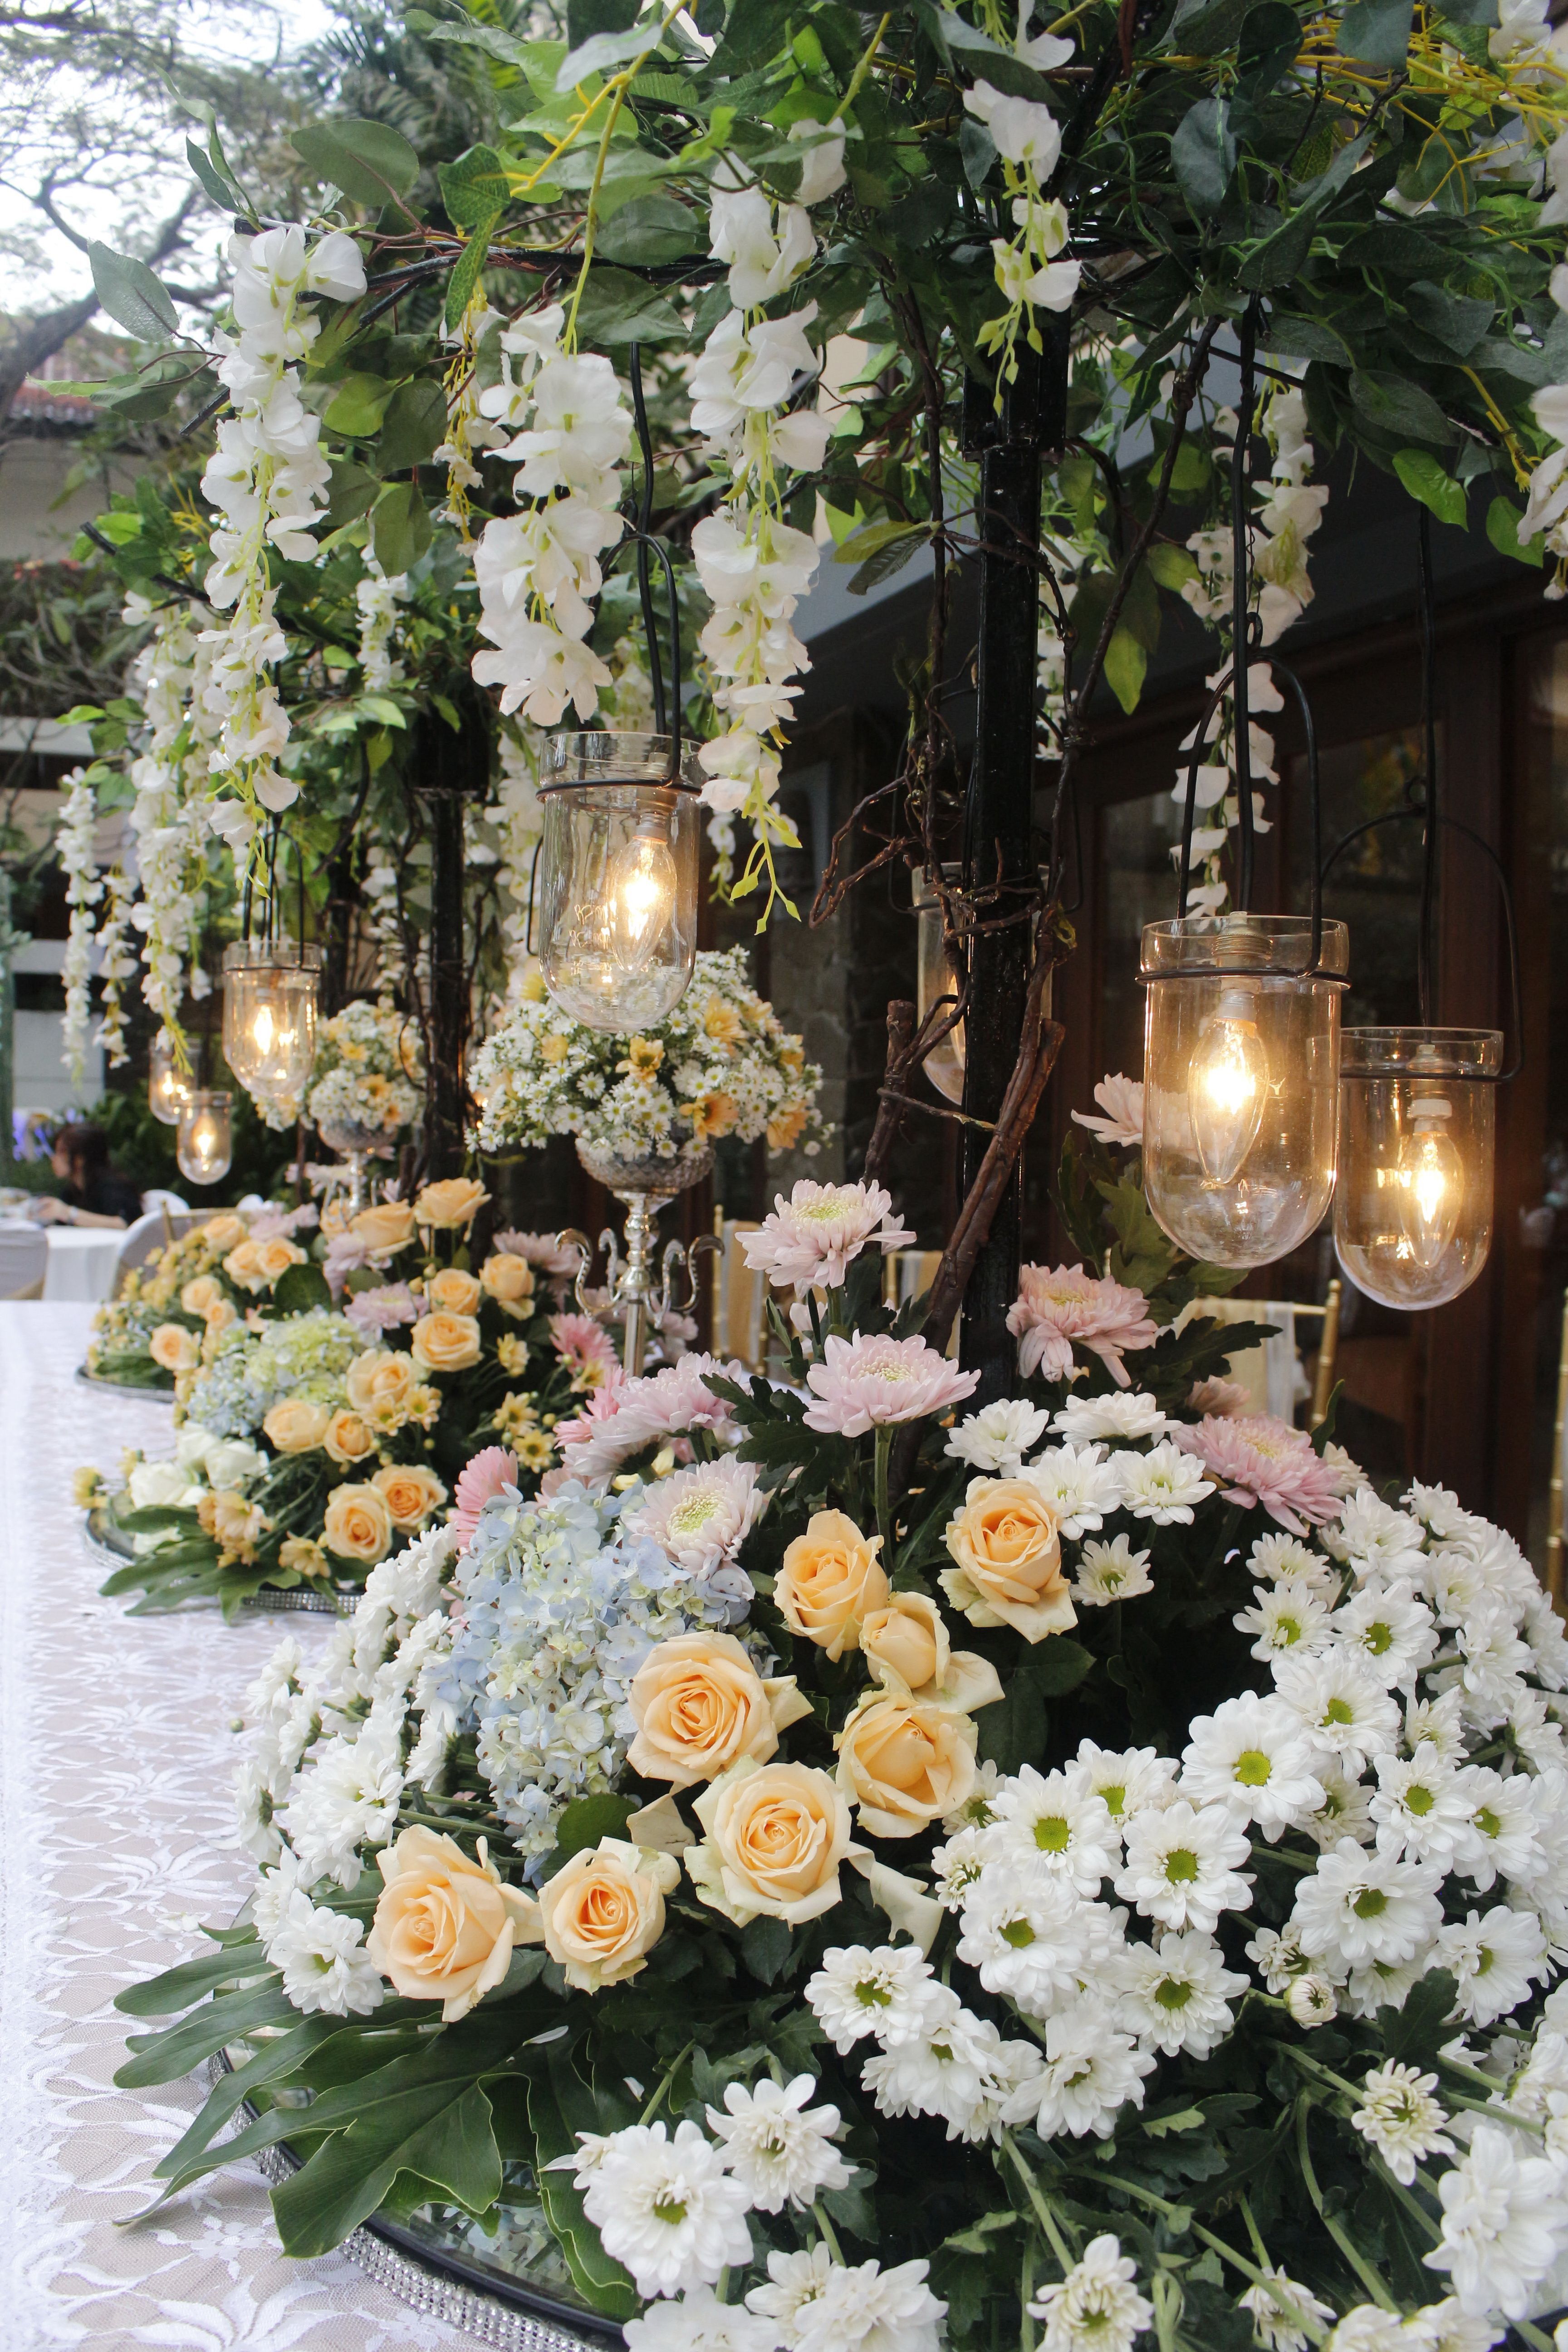 The wedding of valentine vivin novotel surabaya decorated by eden the wedding of valentine vivin novotel surabaya decorated by eden decoration junglespirit Images